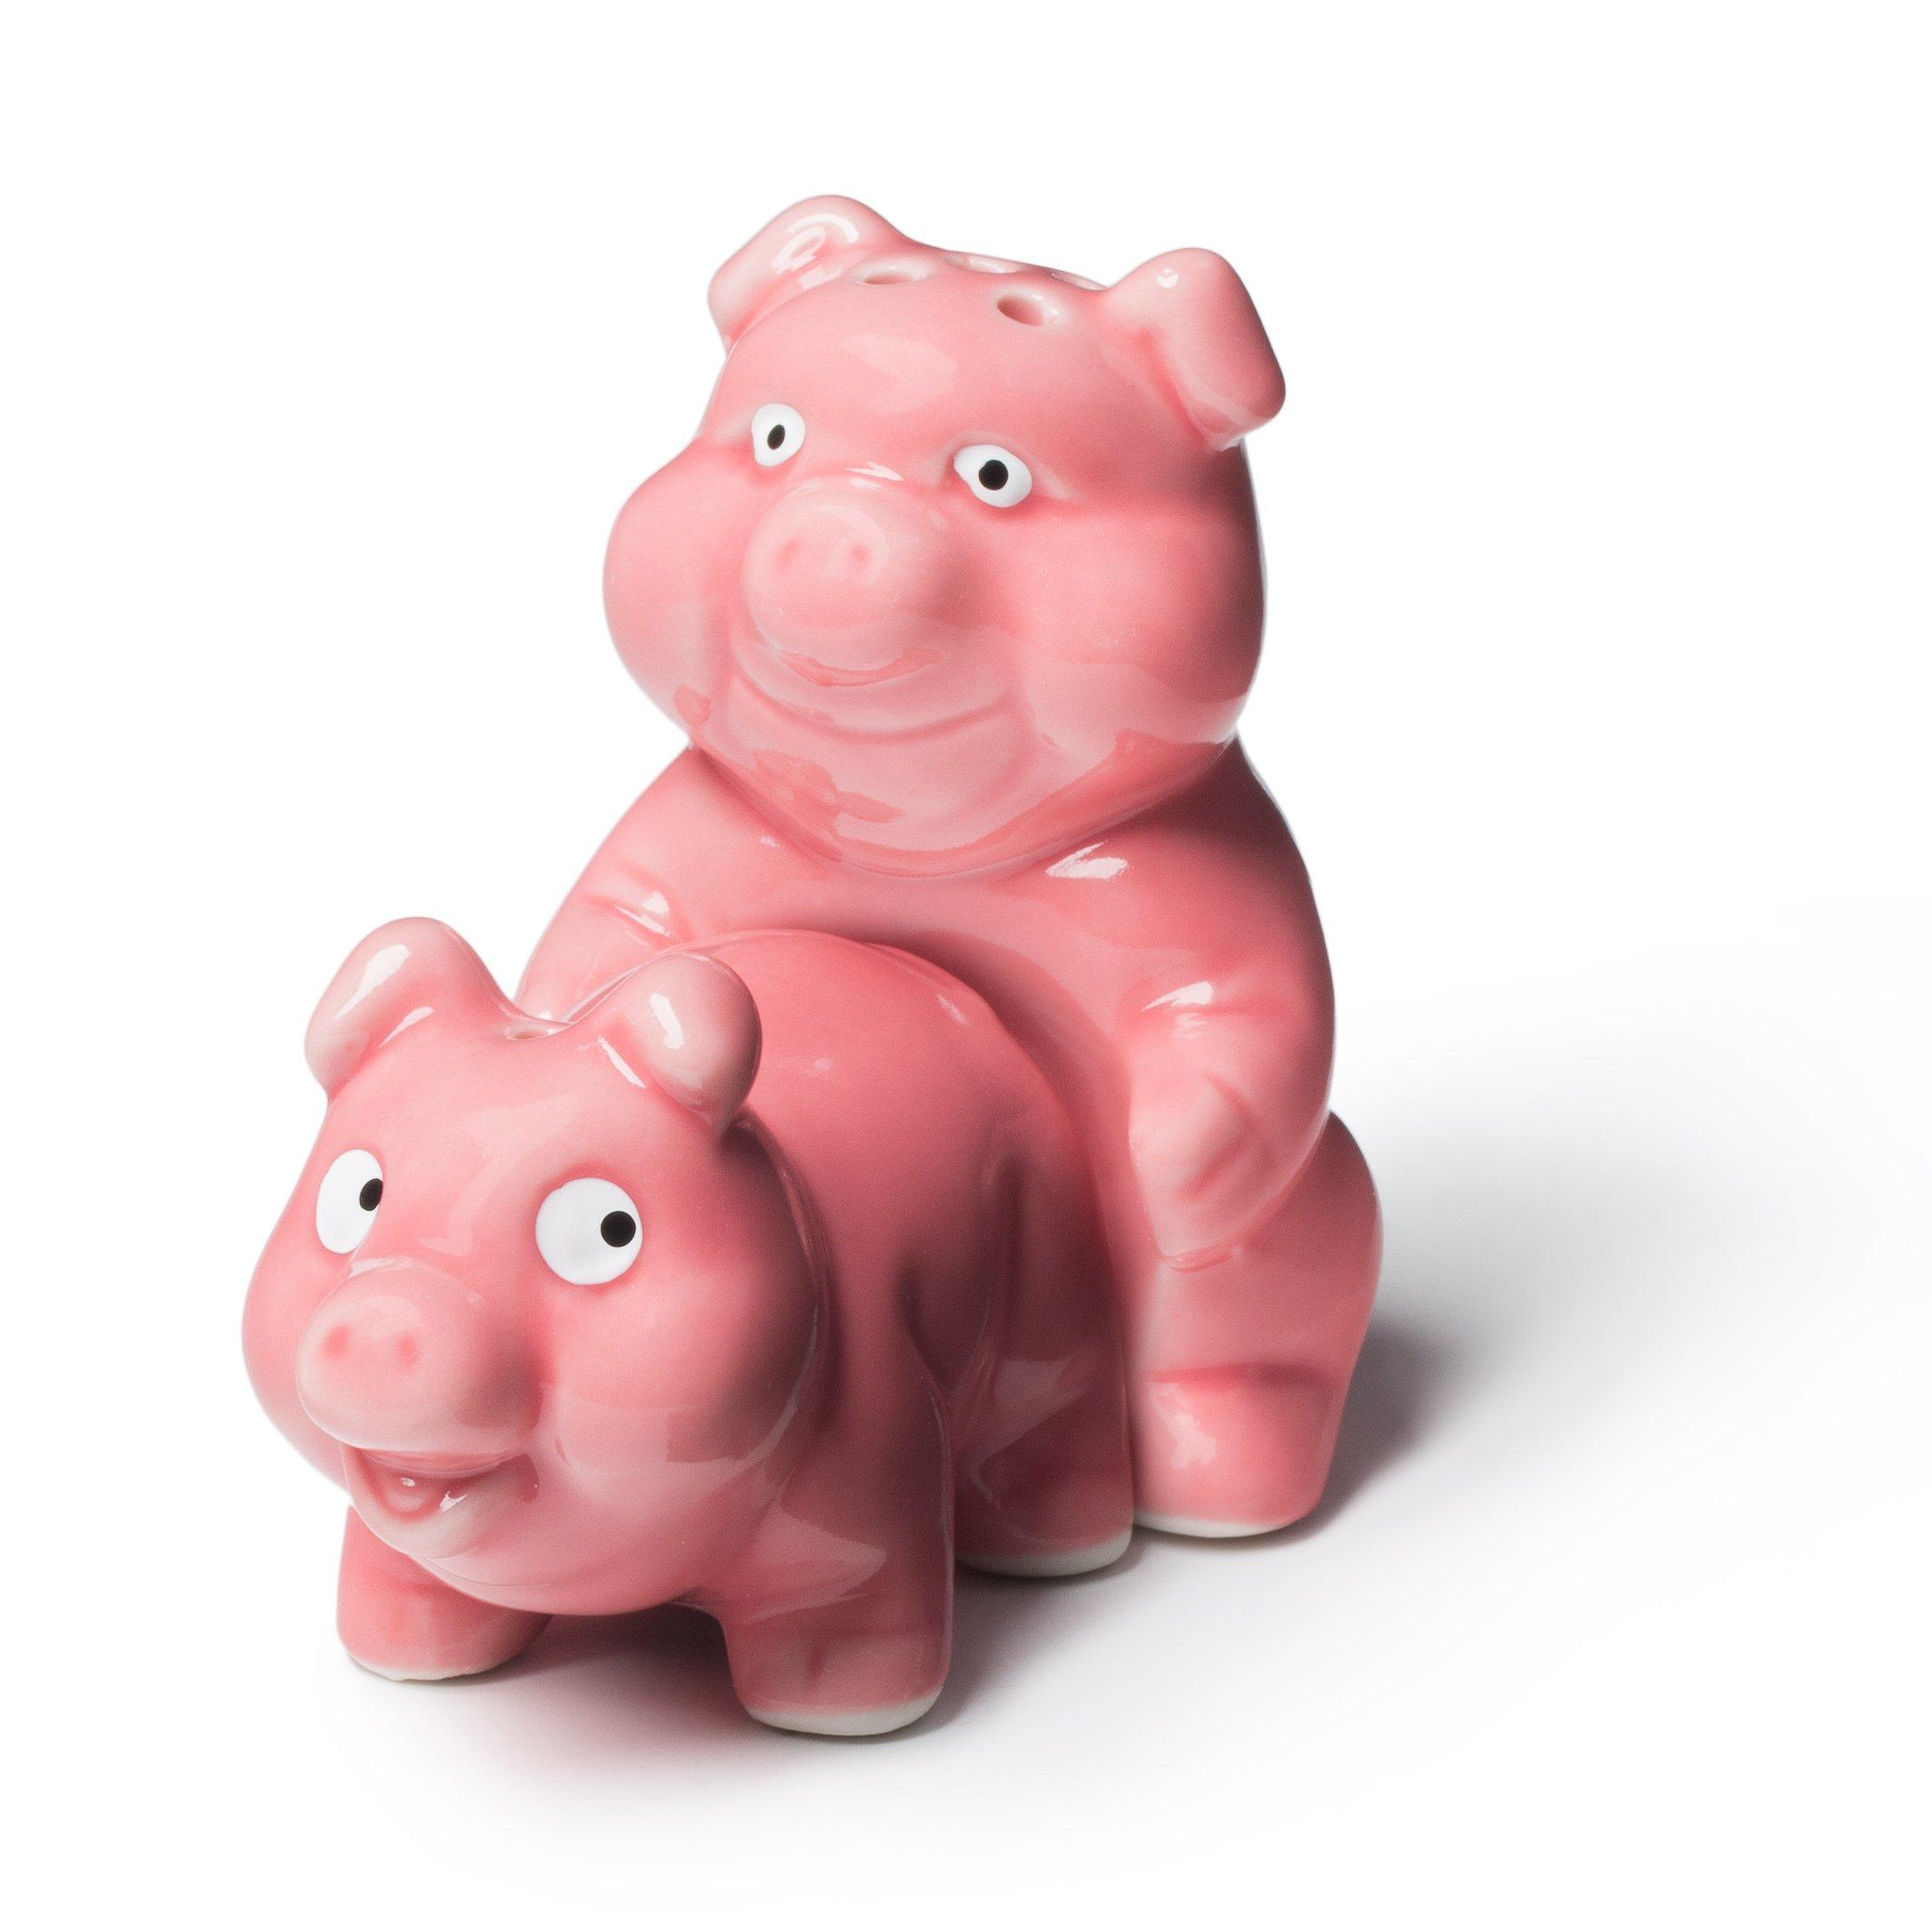 BigMouth Inc Naughty Pigs Novelty Salt and Pepper Shaker Set, Ceramic, Hilarious Kitchen Gag Gift